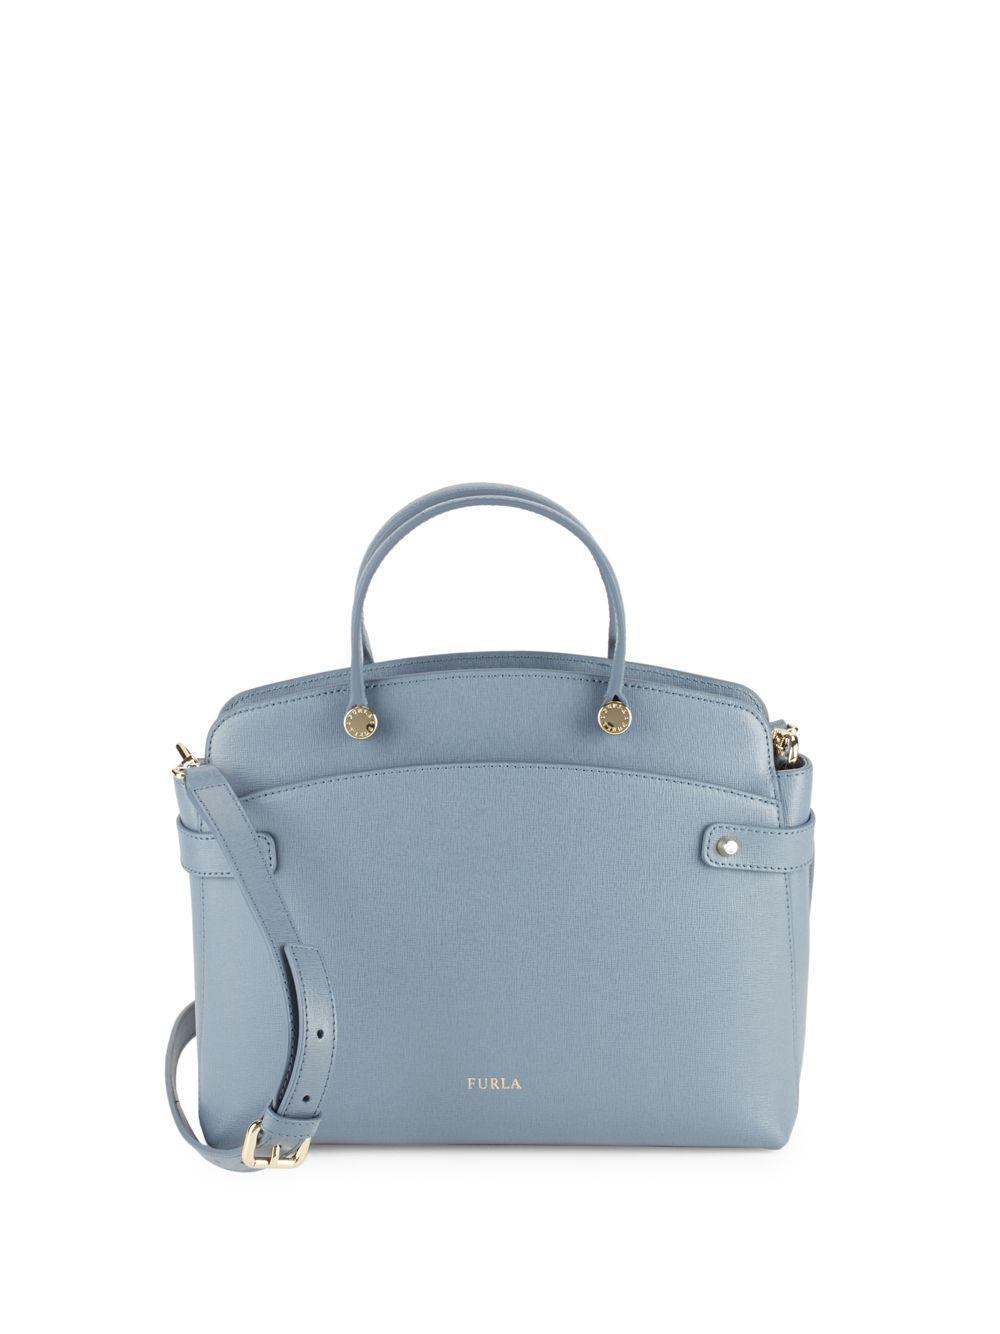 6aedd41ba7 Lyst - Furla Leather To Zip Shoulder Bag in Blue